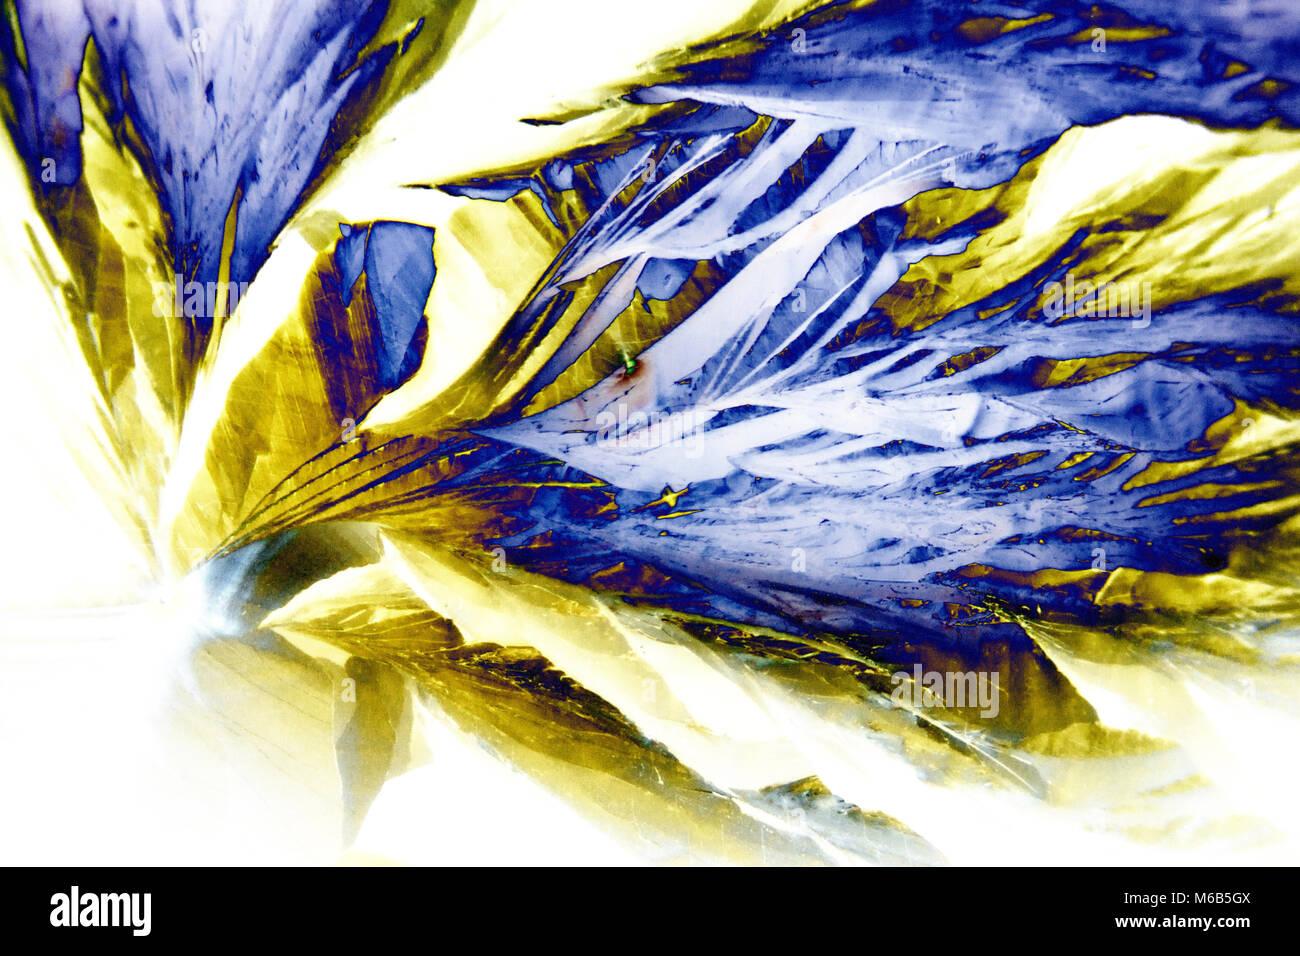 Microcrystals of tartaric acid in polarized light - Stock Image